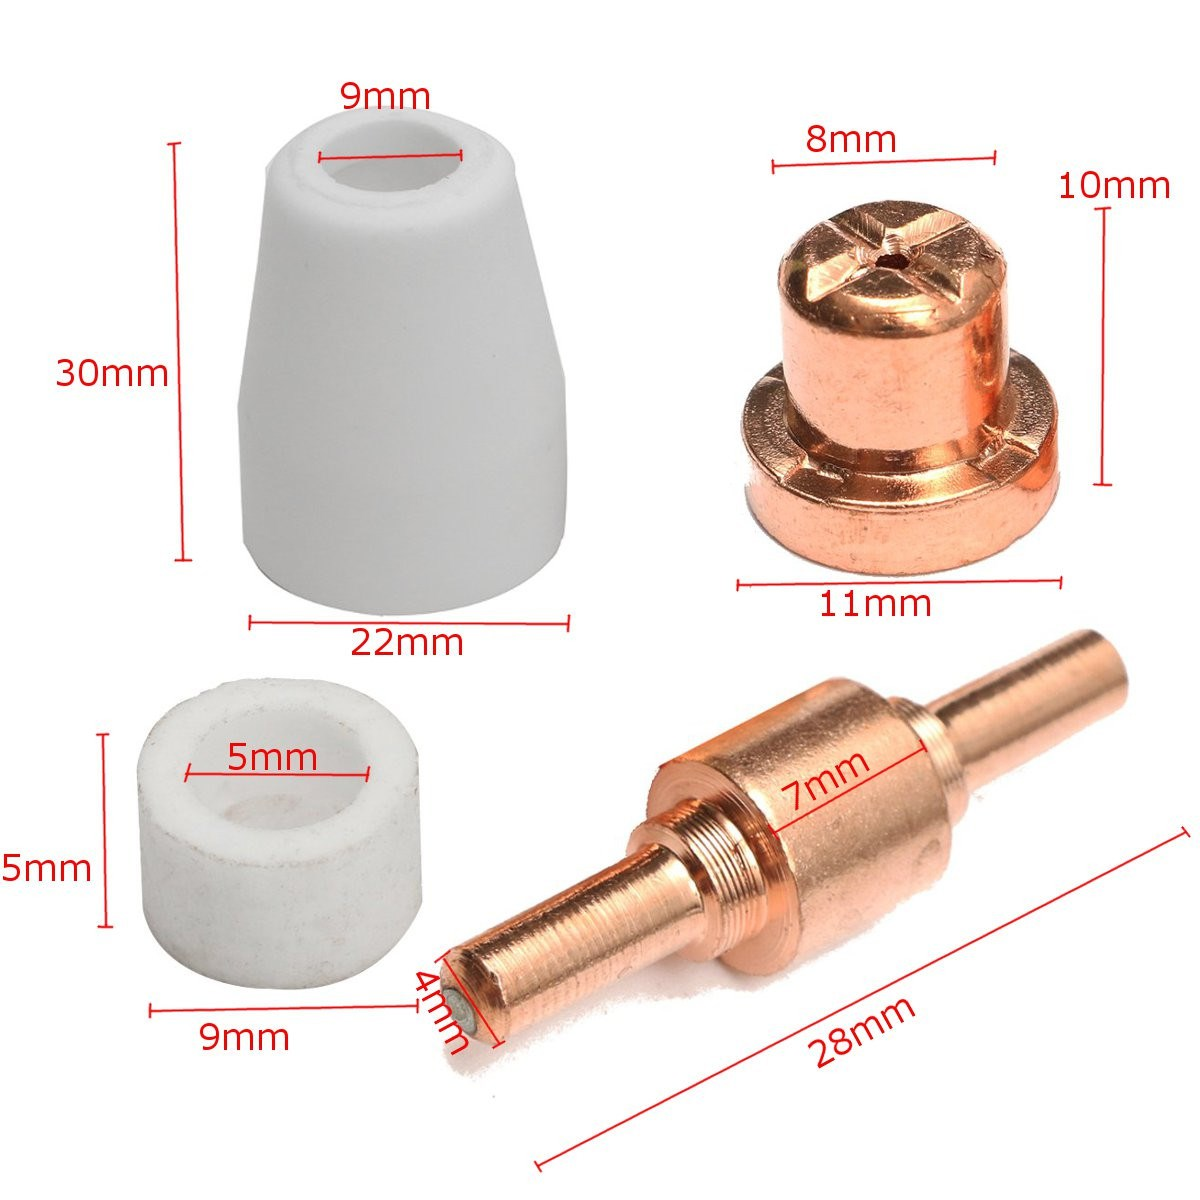 Pt31 Lg40 Plasma Cutter Torch Electrode Tip Nozzle Consumable Circuit Accessory 130pcs